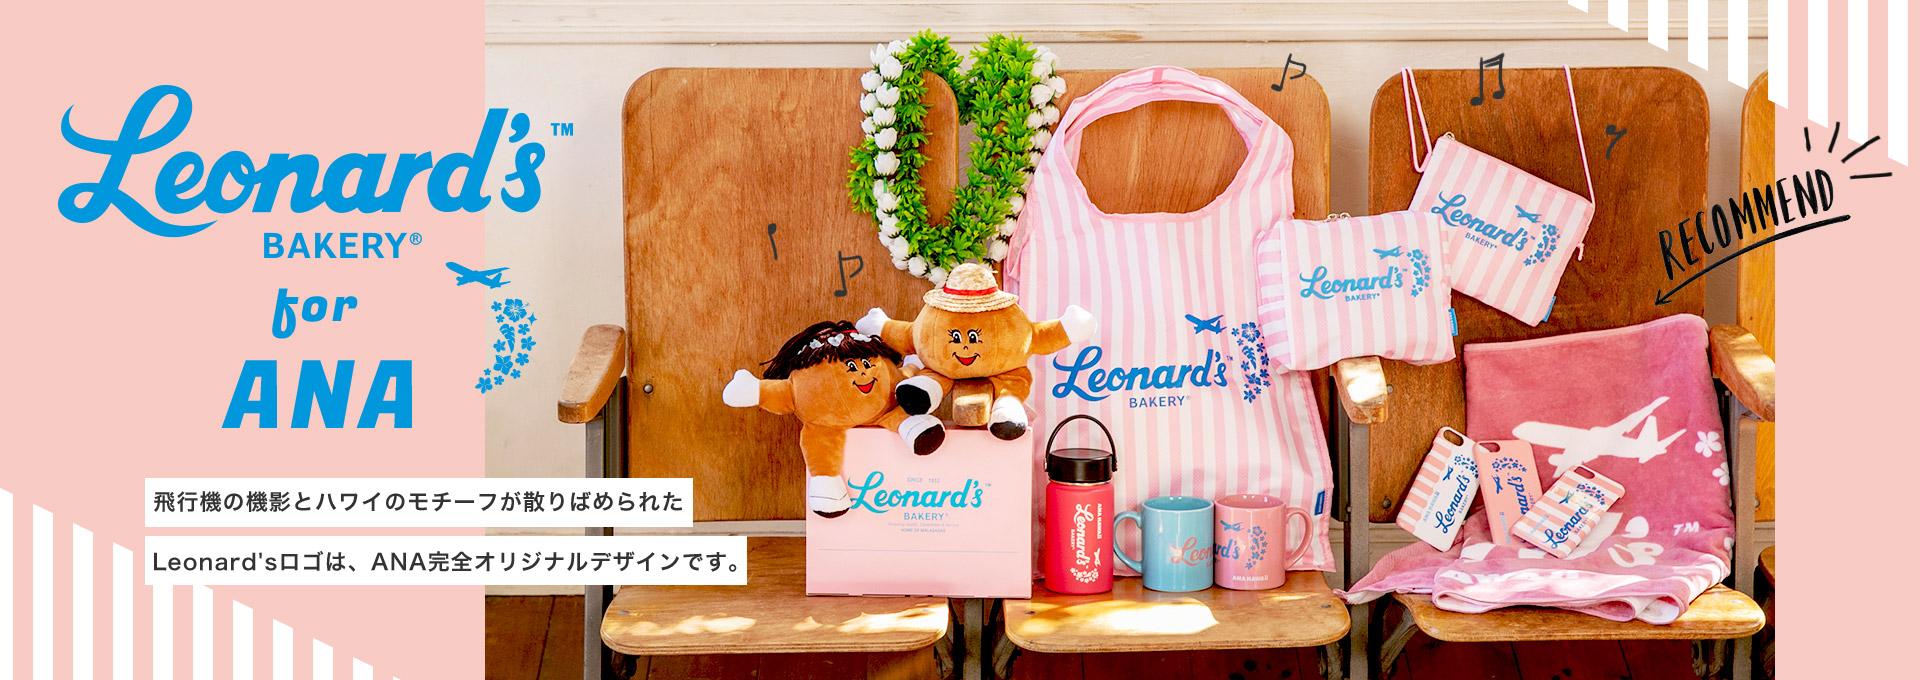 Leonard's for ANA